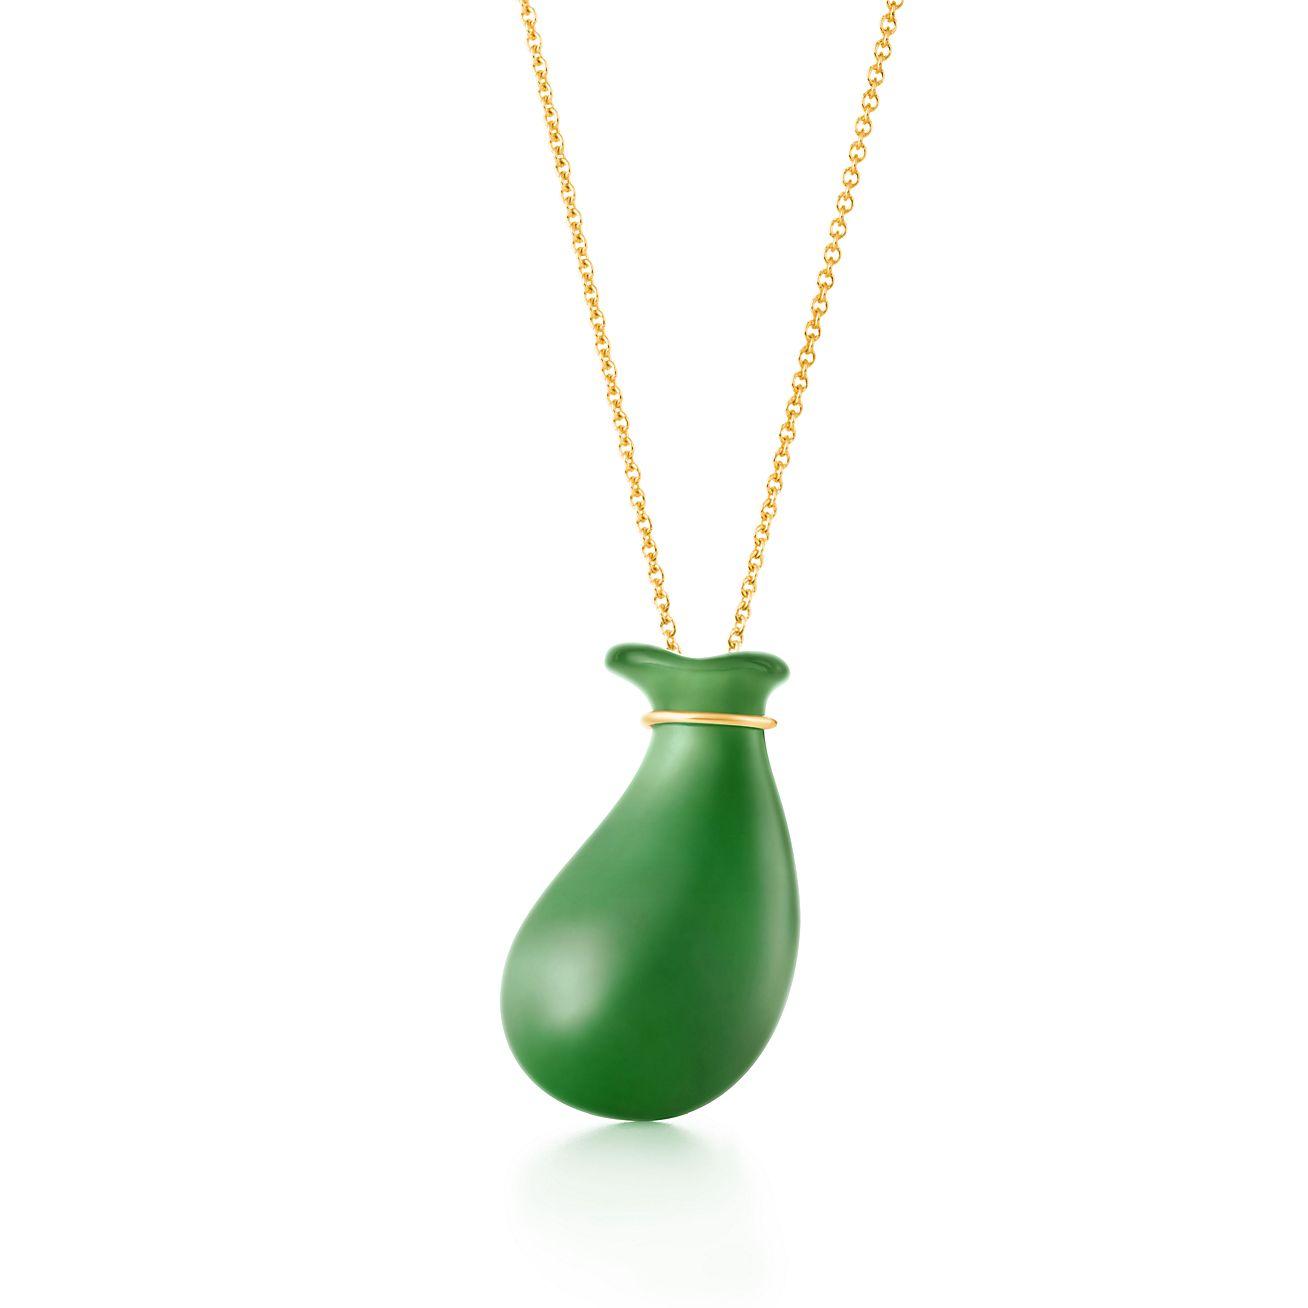 Elsa Peretti Bean earrings in 18k gold and green jade Tiffany & Co.